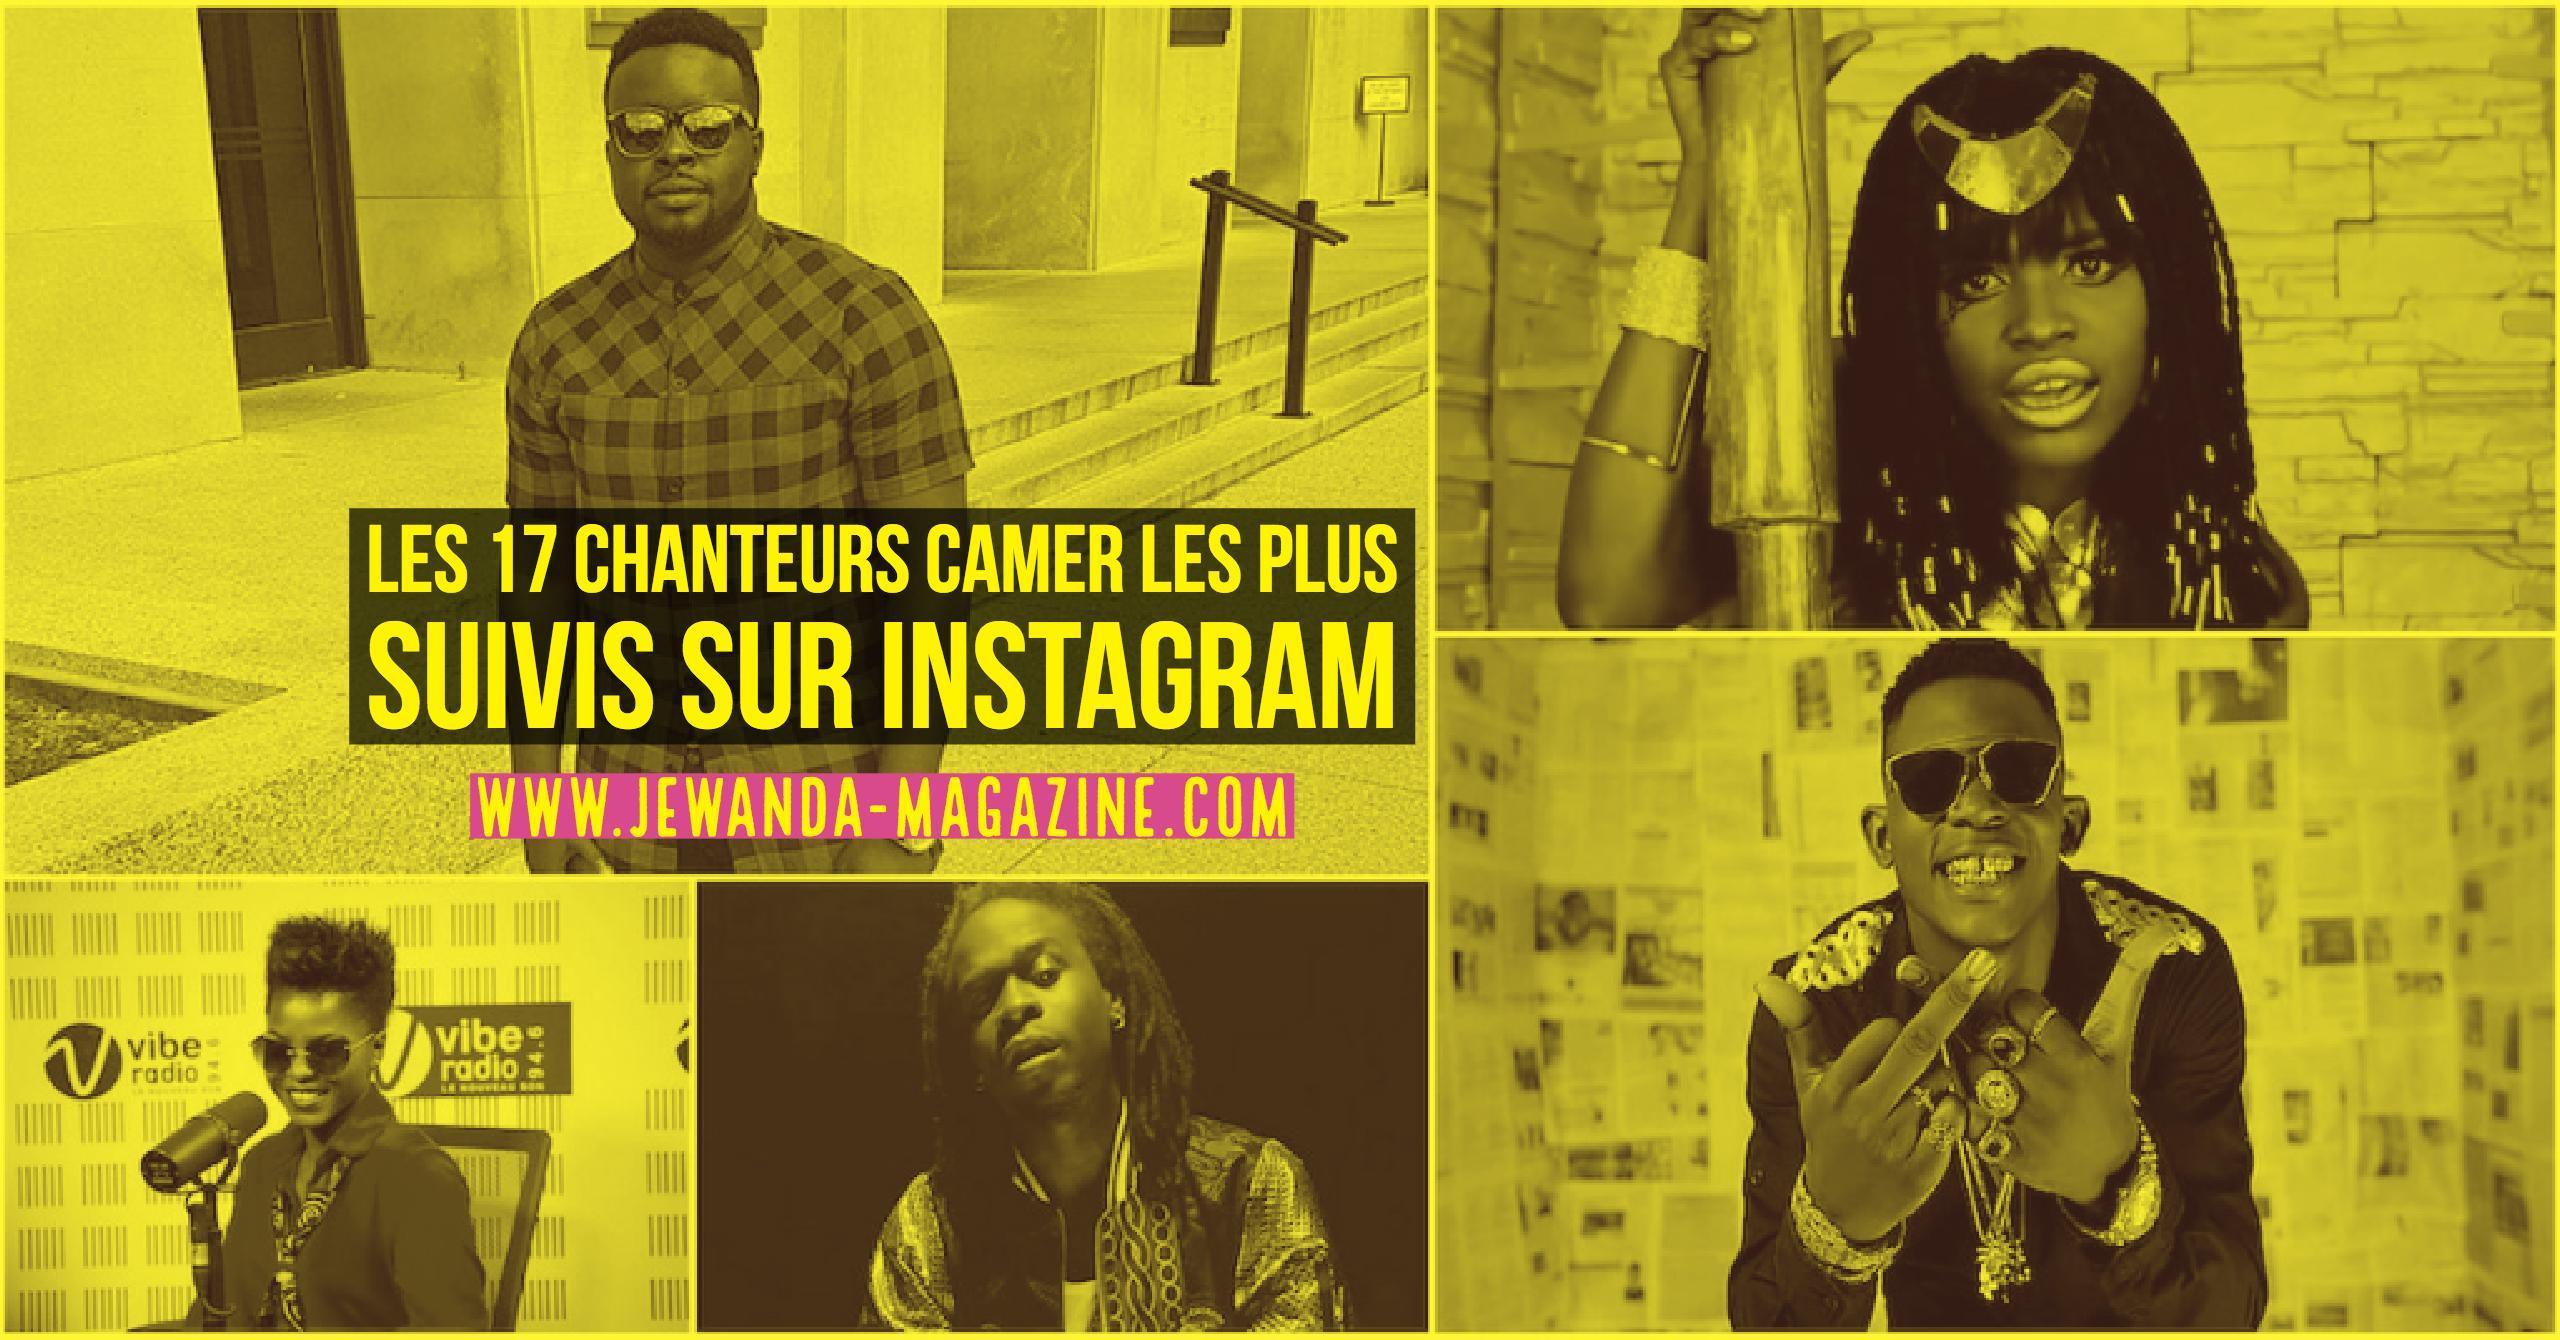 chanteurs-camer-instagram-jewanda